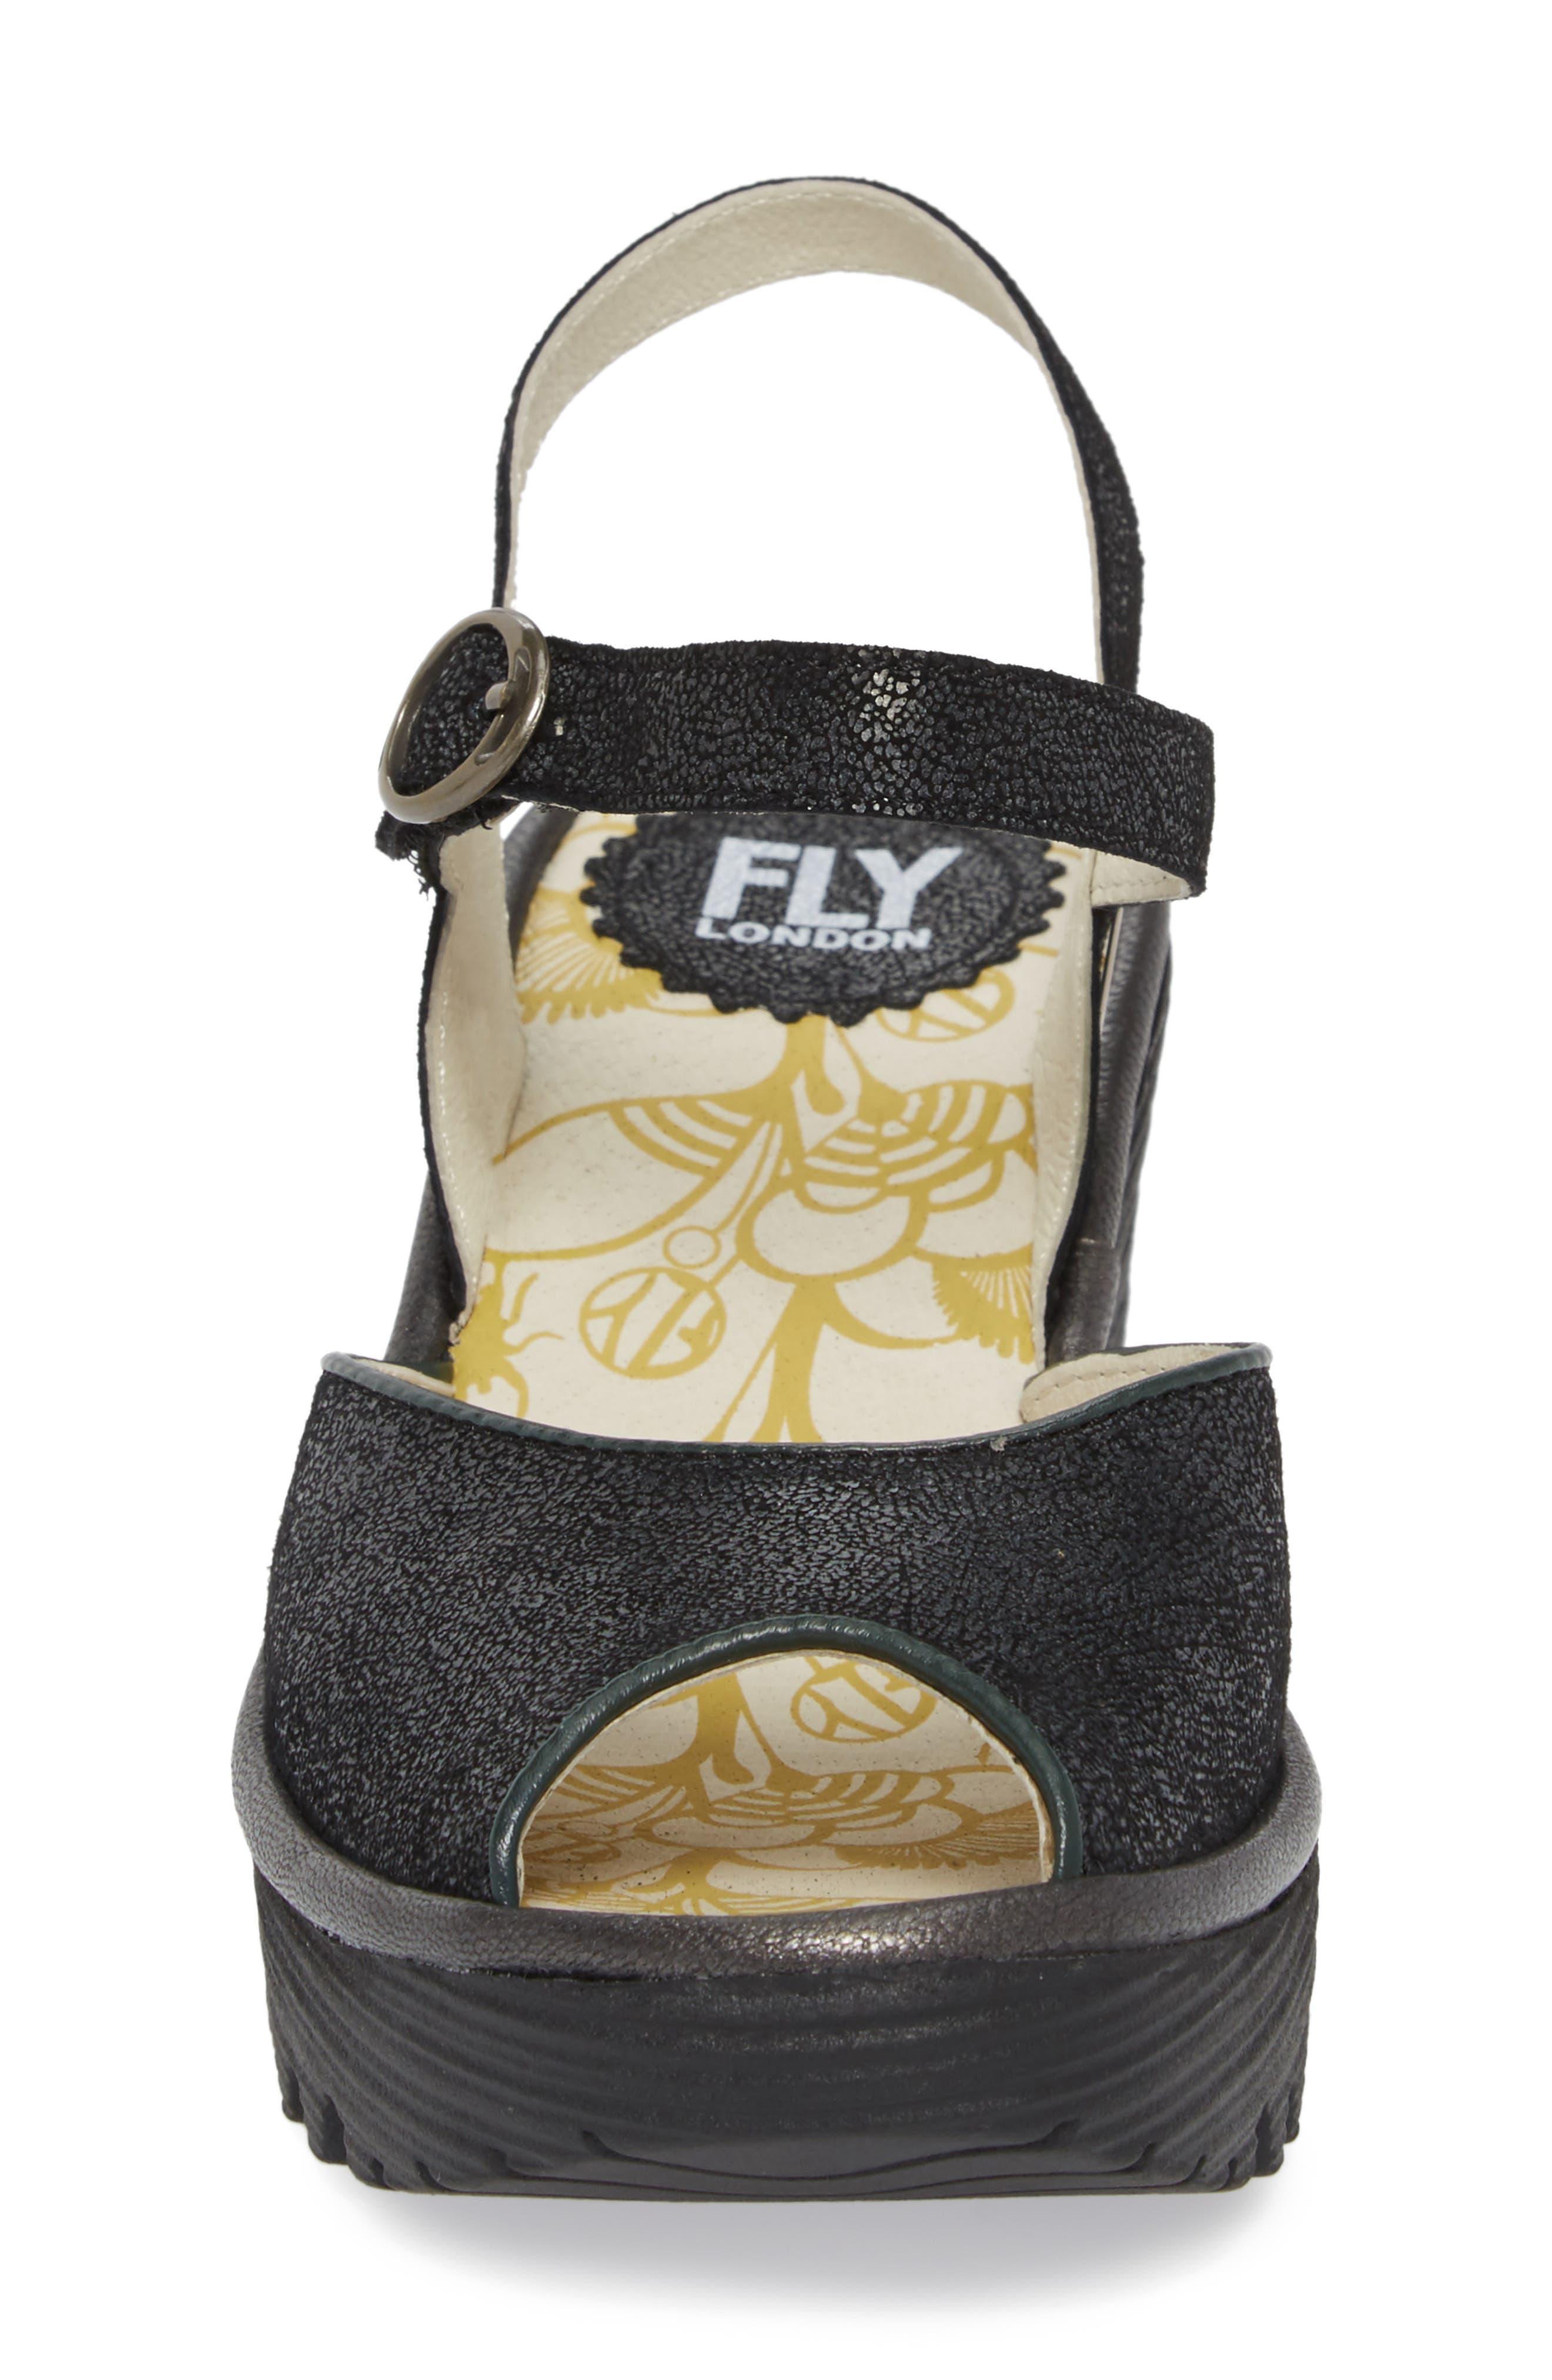 FLY LONDON, Yora Wedge Sandal, Alternate thumbnail 4, color, BLACK/ GRAPHITE LEATHER